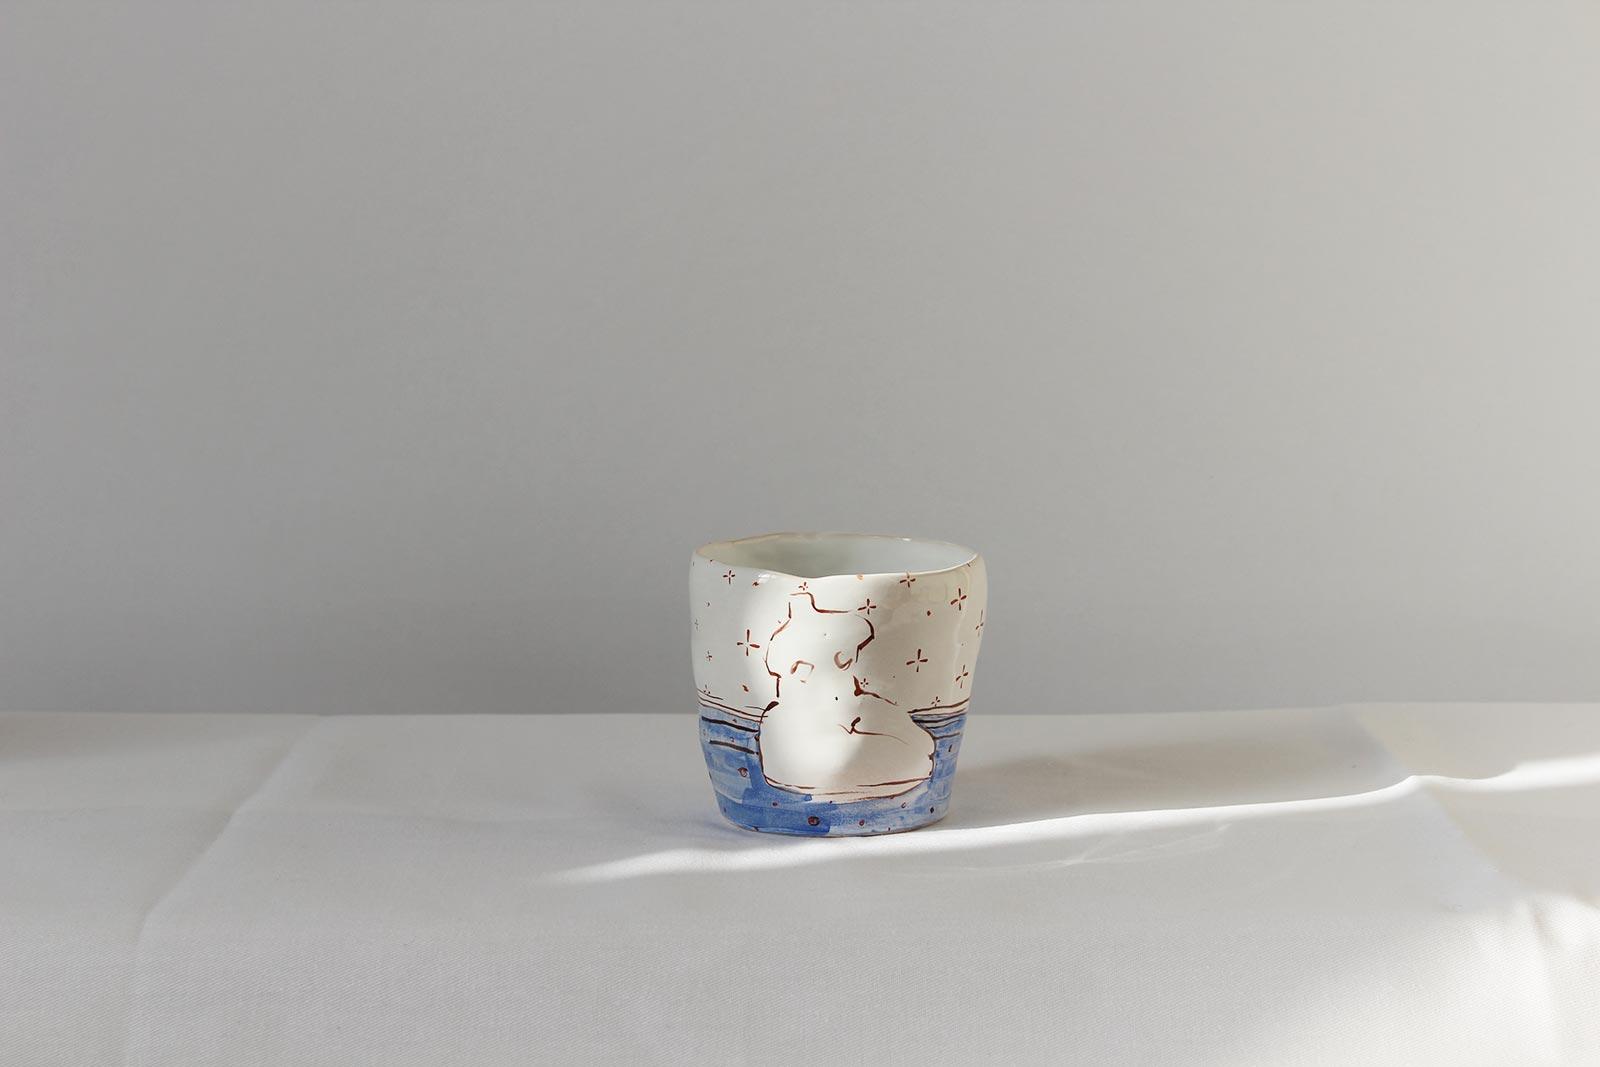 Side view - Decorative glass (Handmade)